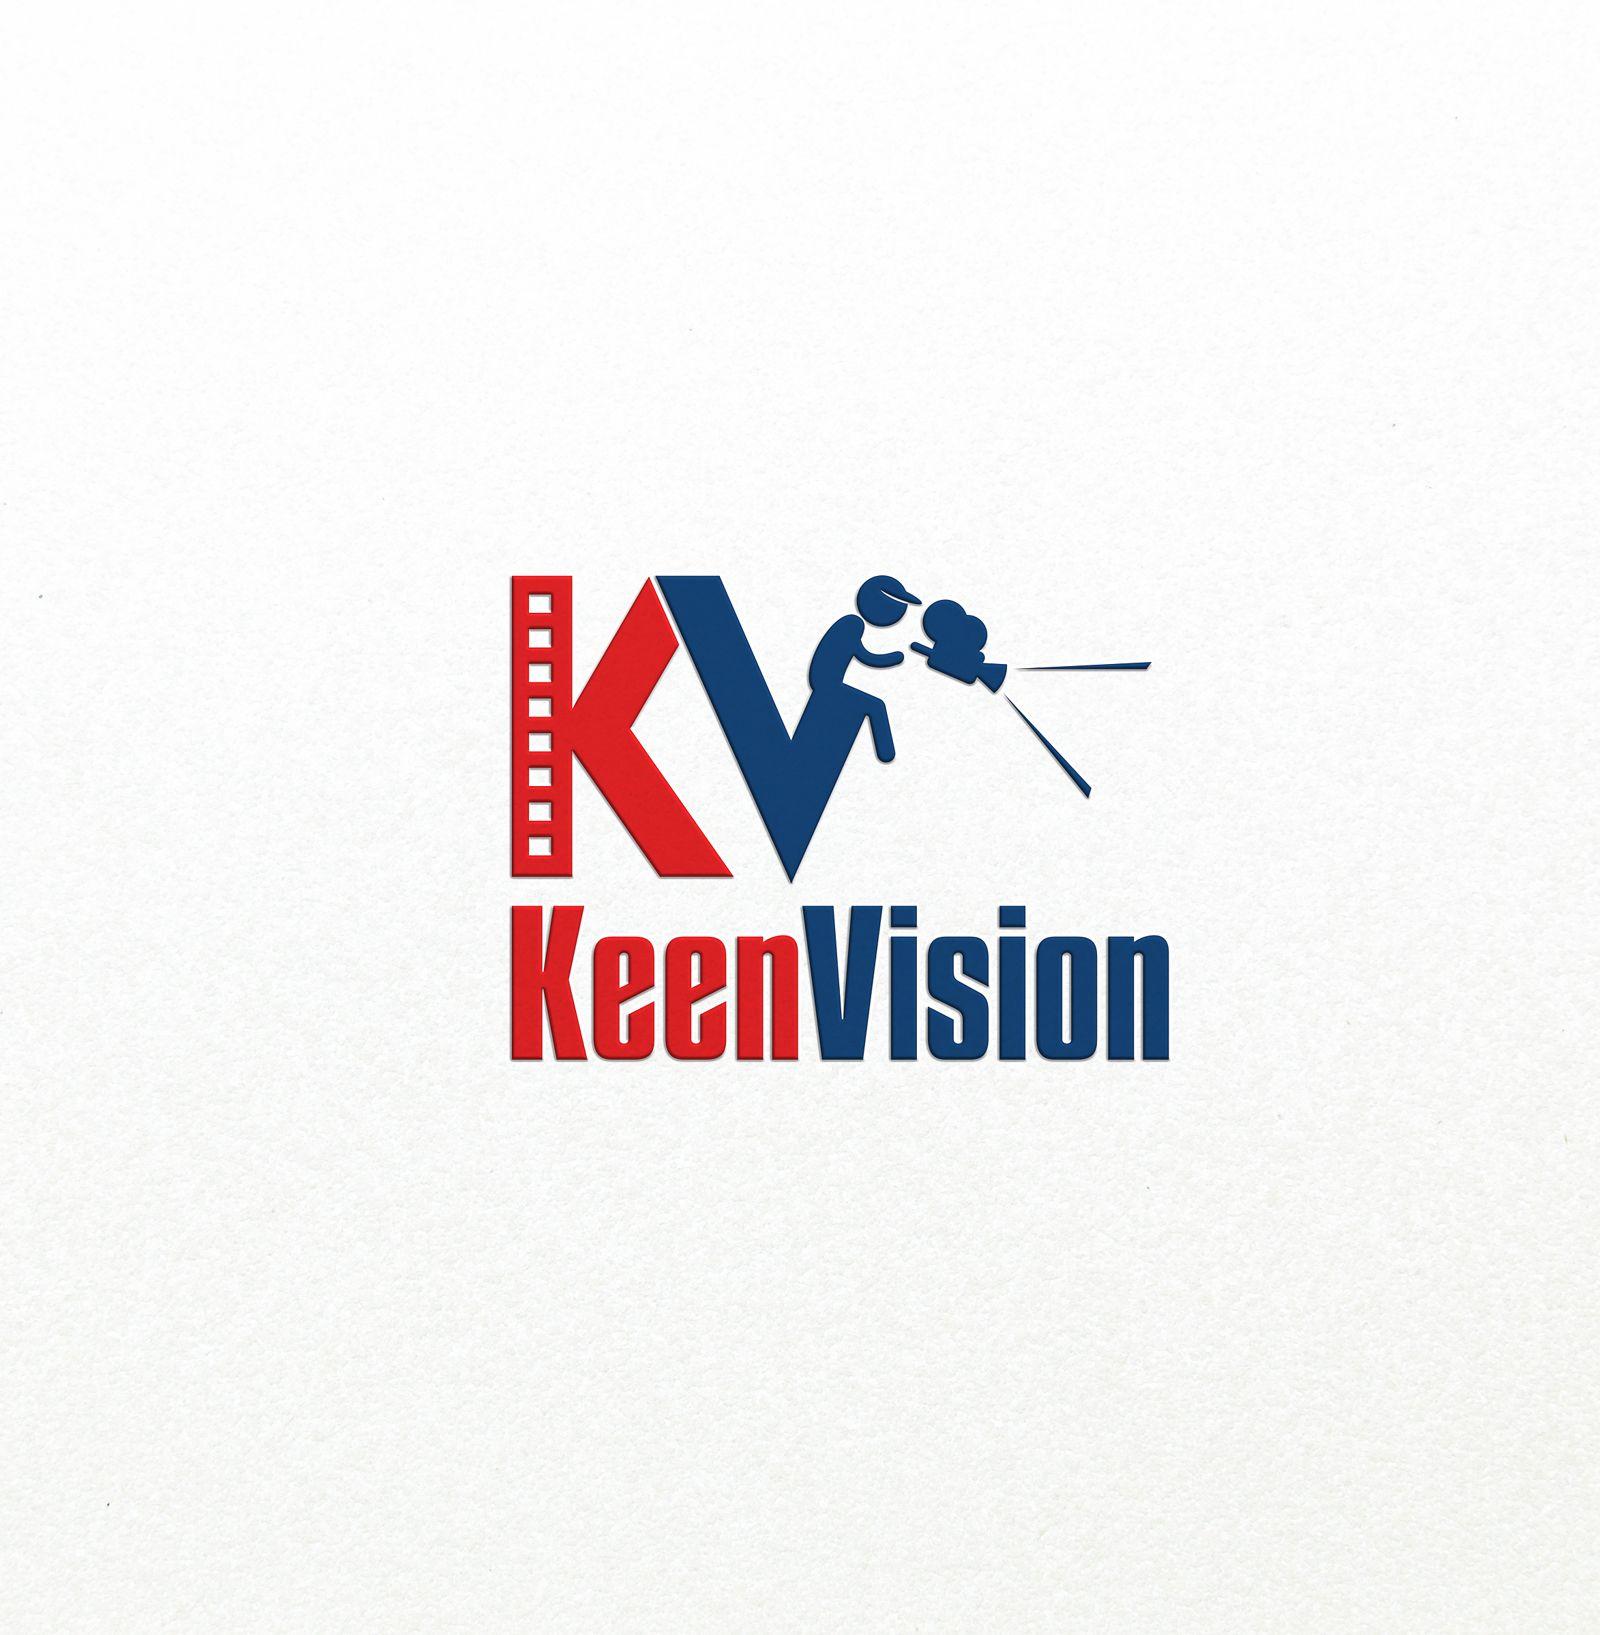 Логотип для KeenVision - дизайнер ilim1973